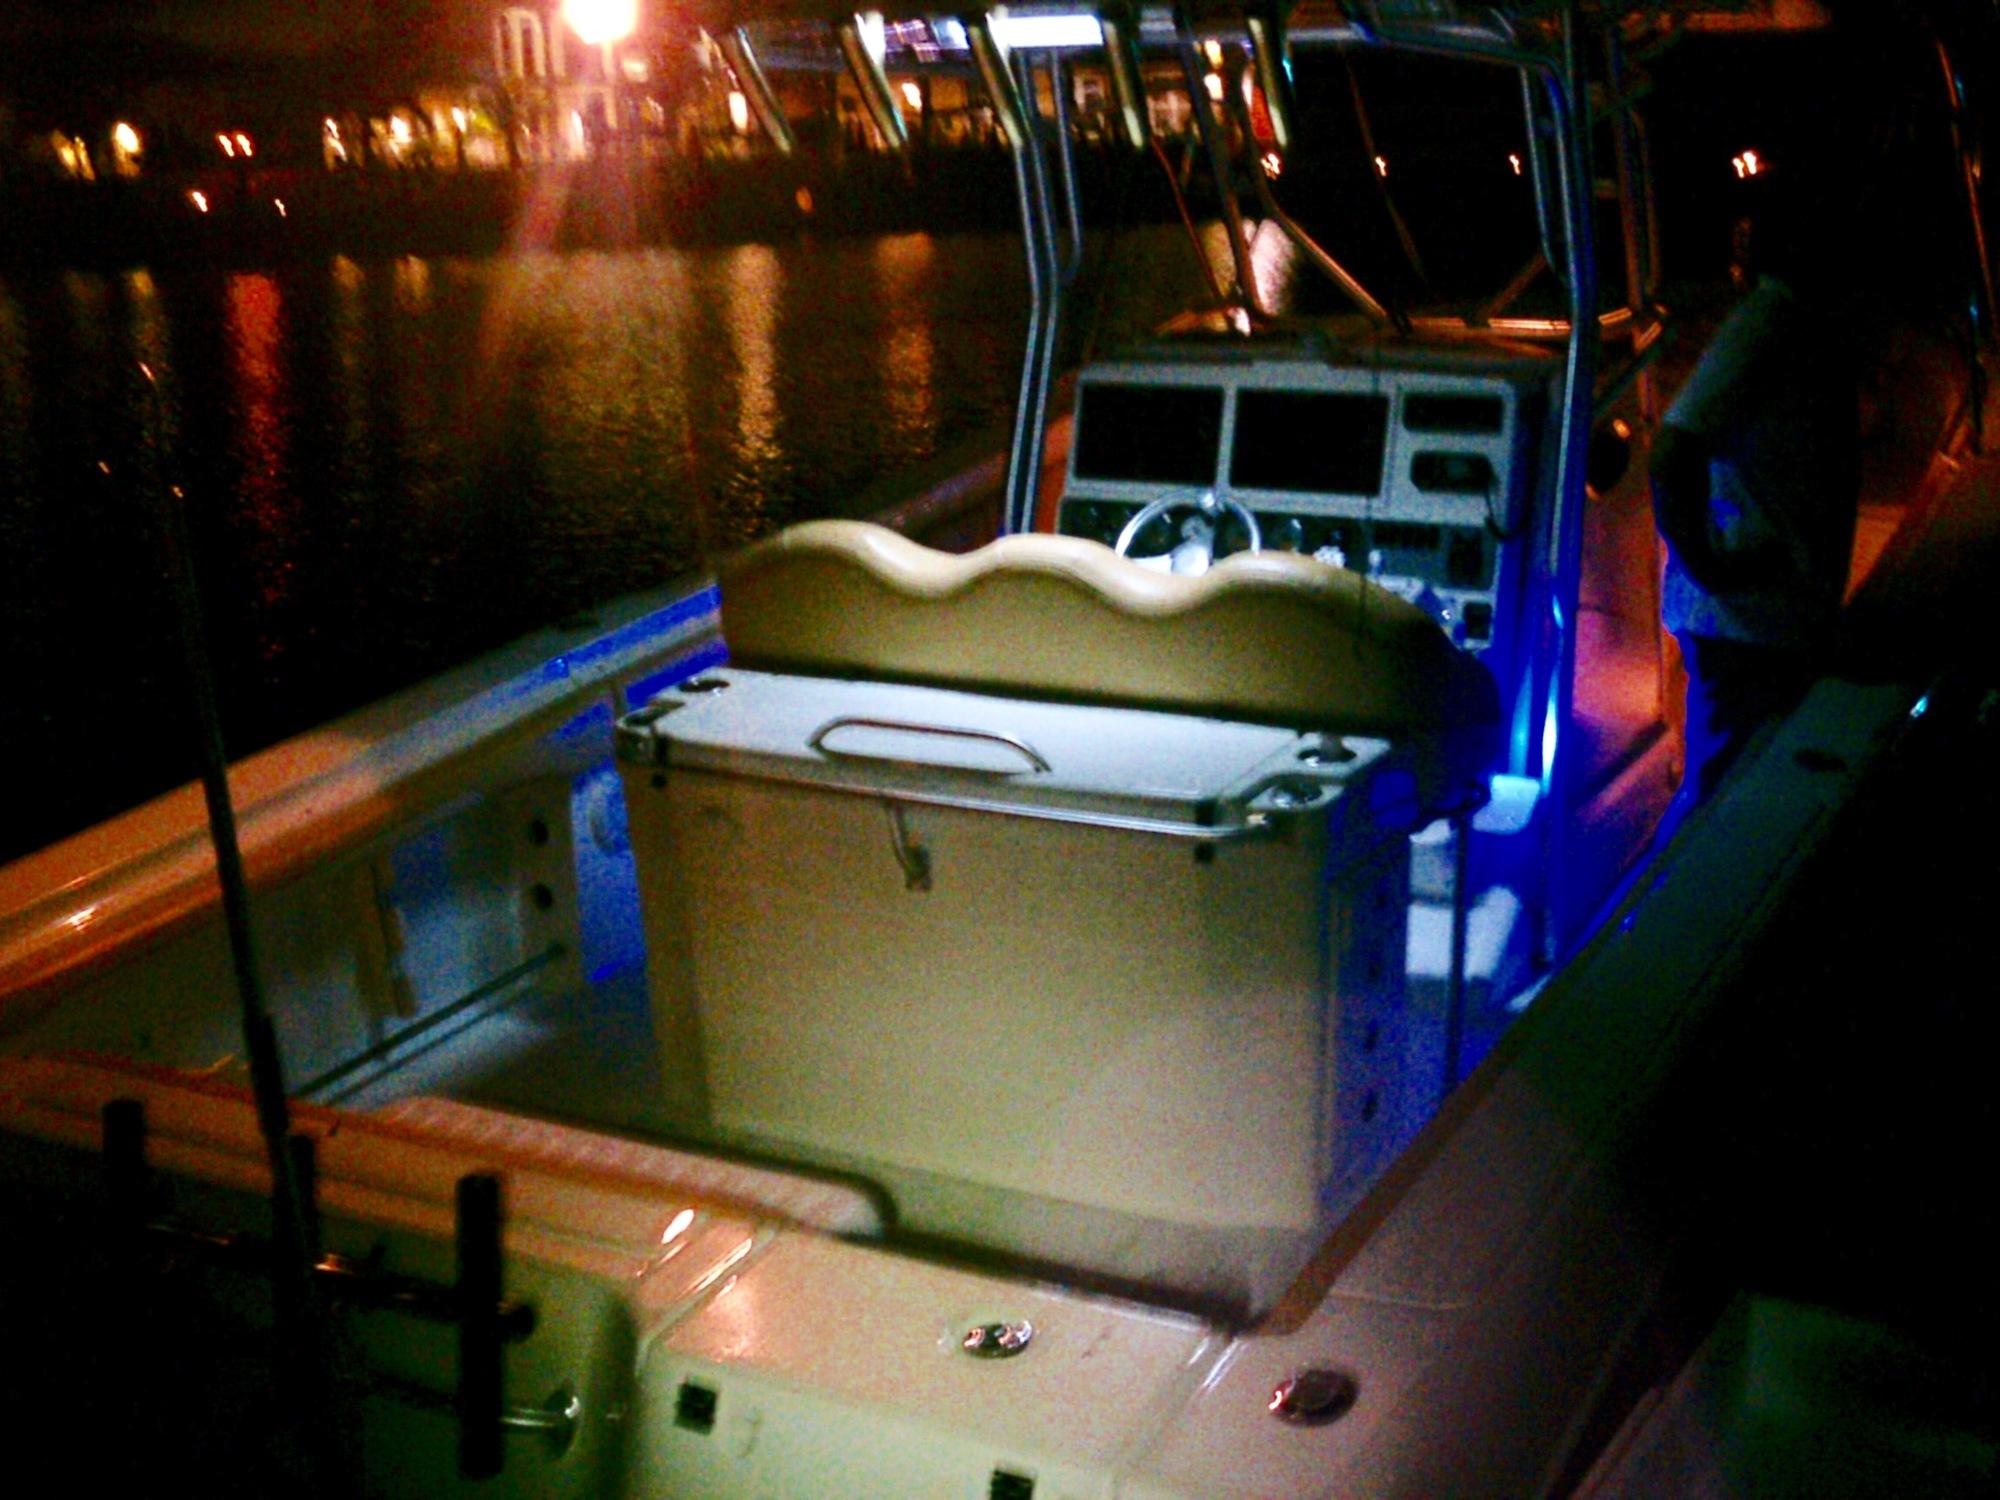 Coast Guard halts illegal charter near Mallory Square